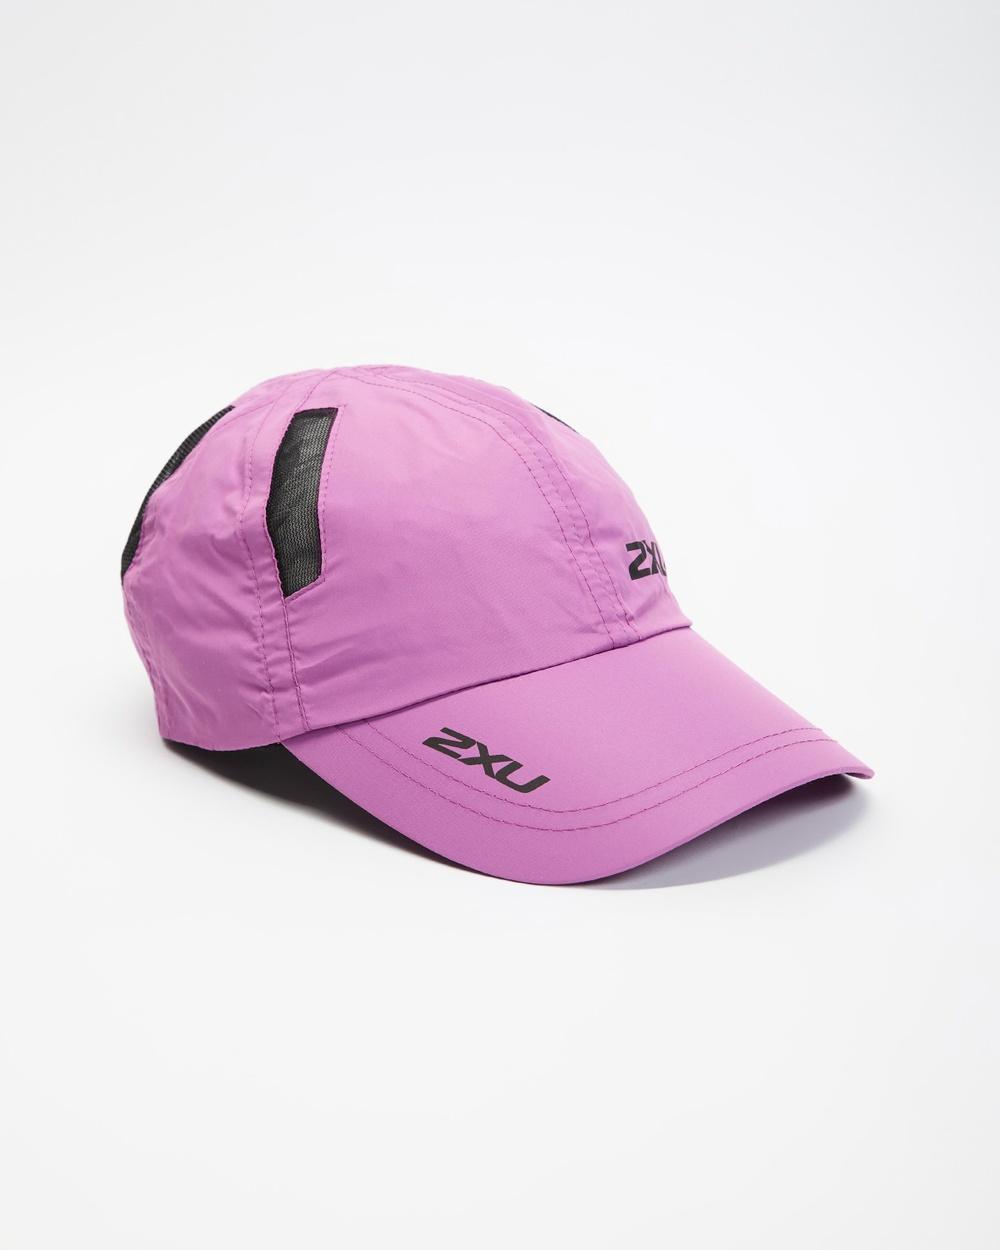 2XU Run Cap Headwear Orchid Mist & Black